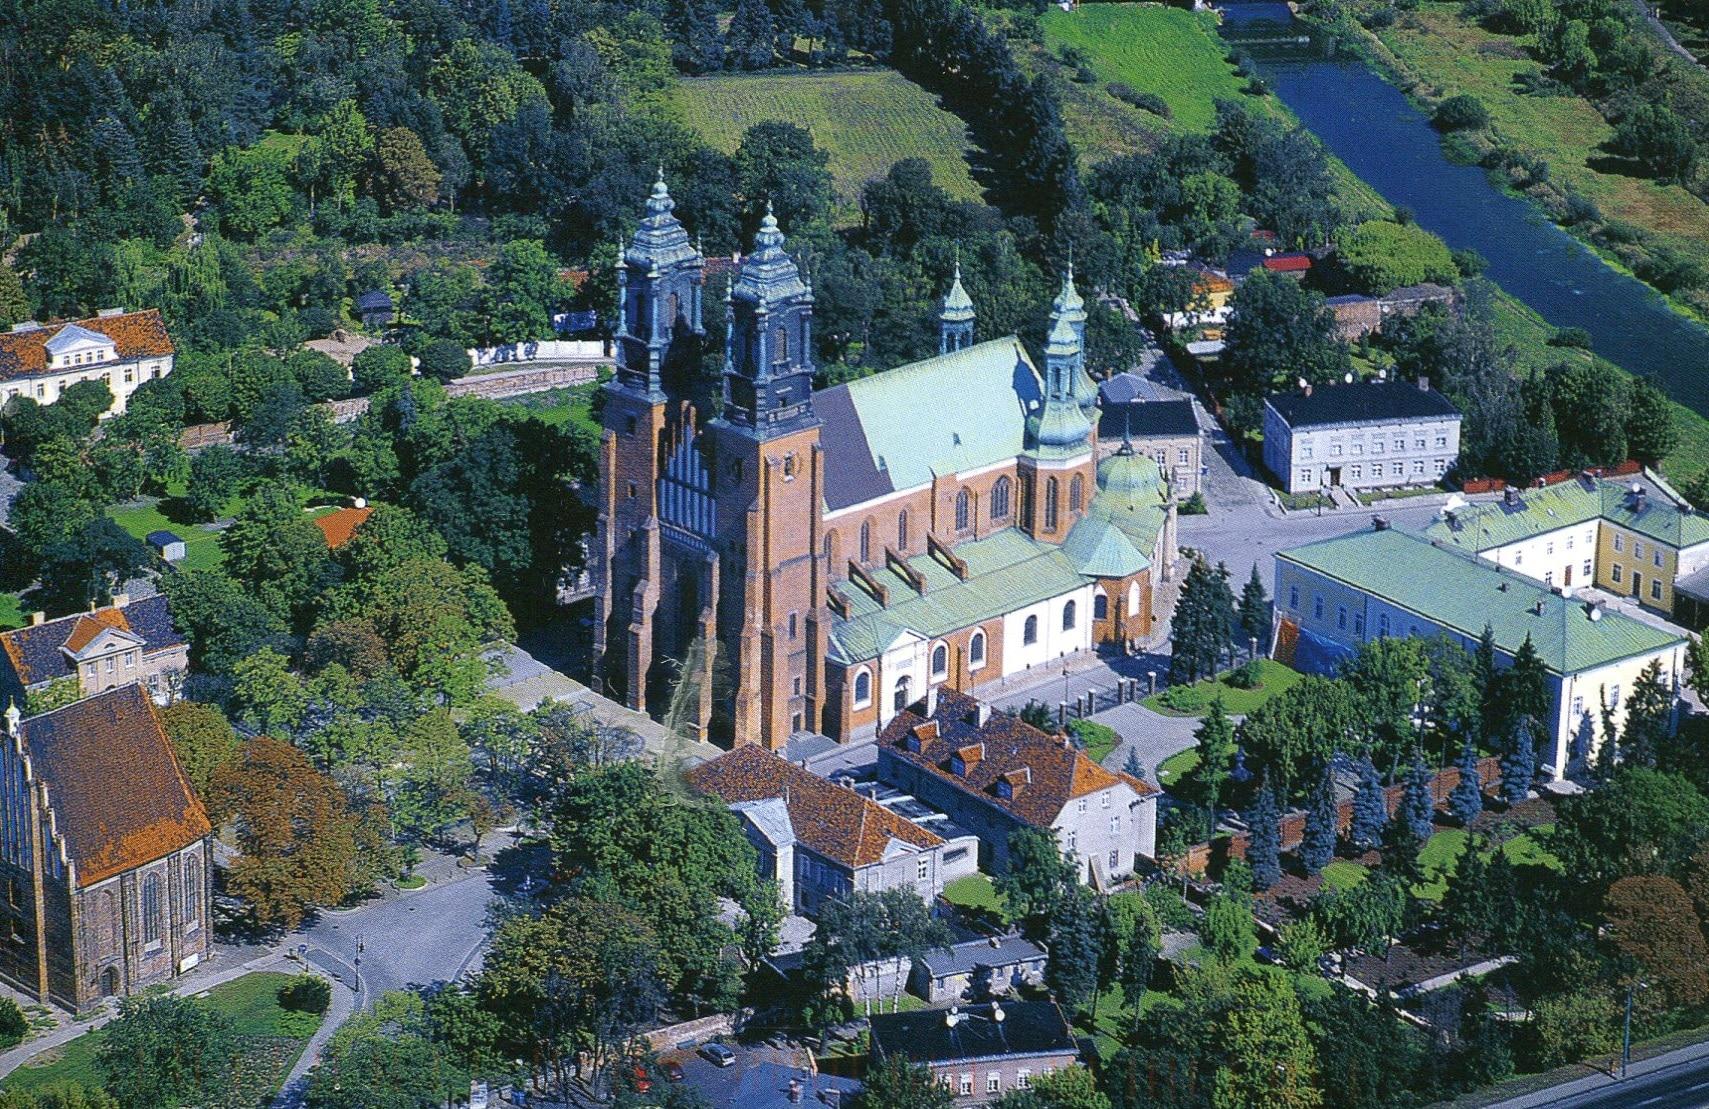 Biserica Sf. Petru și Pavel din Poznan